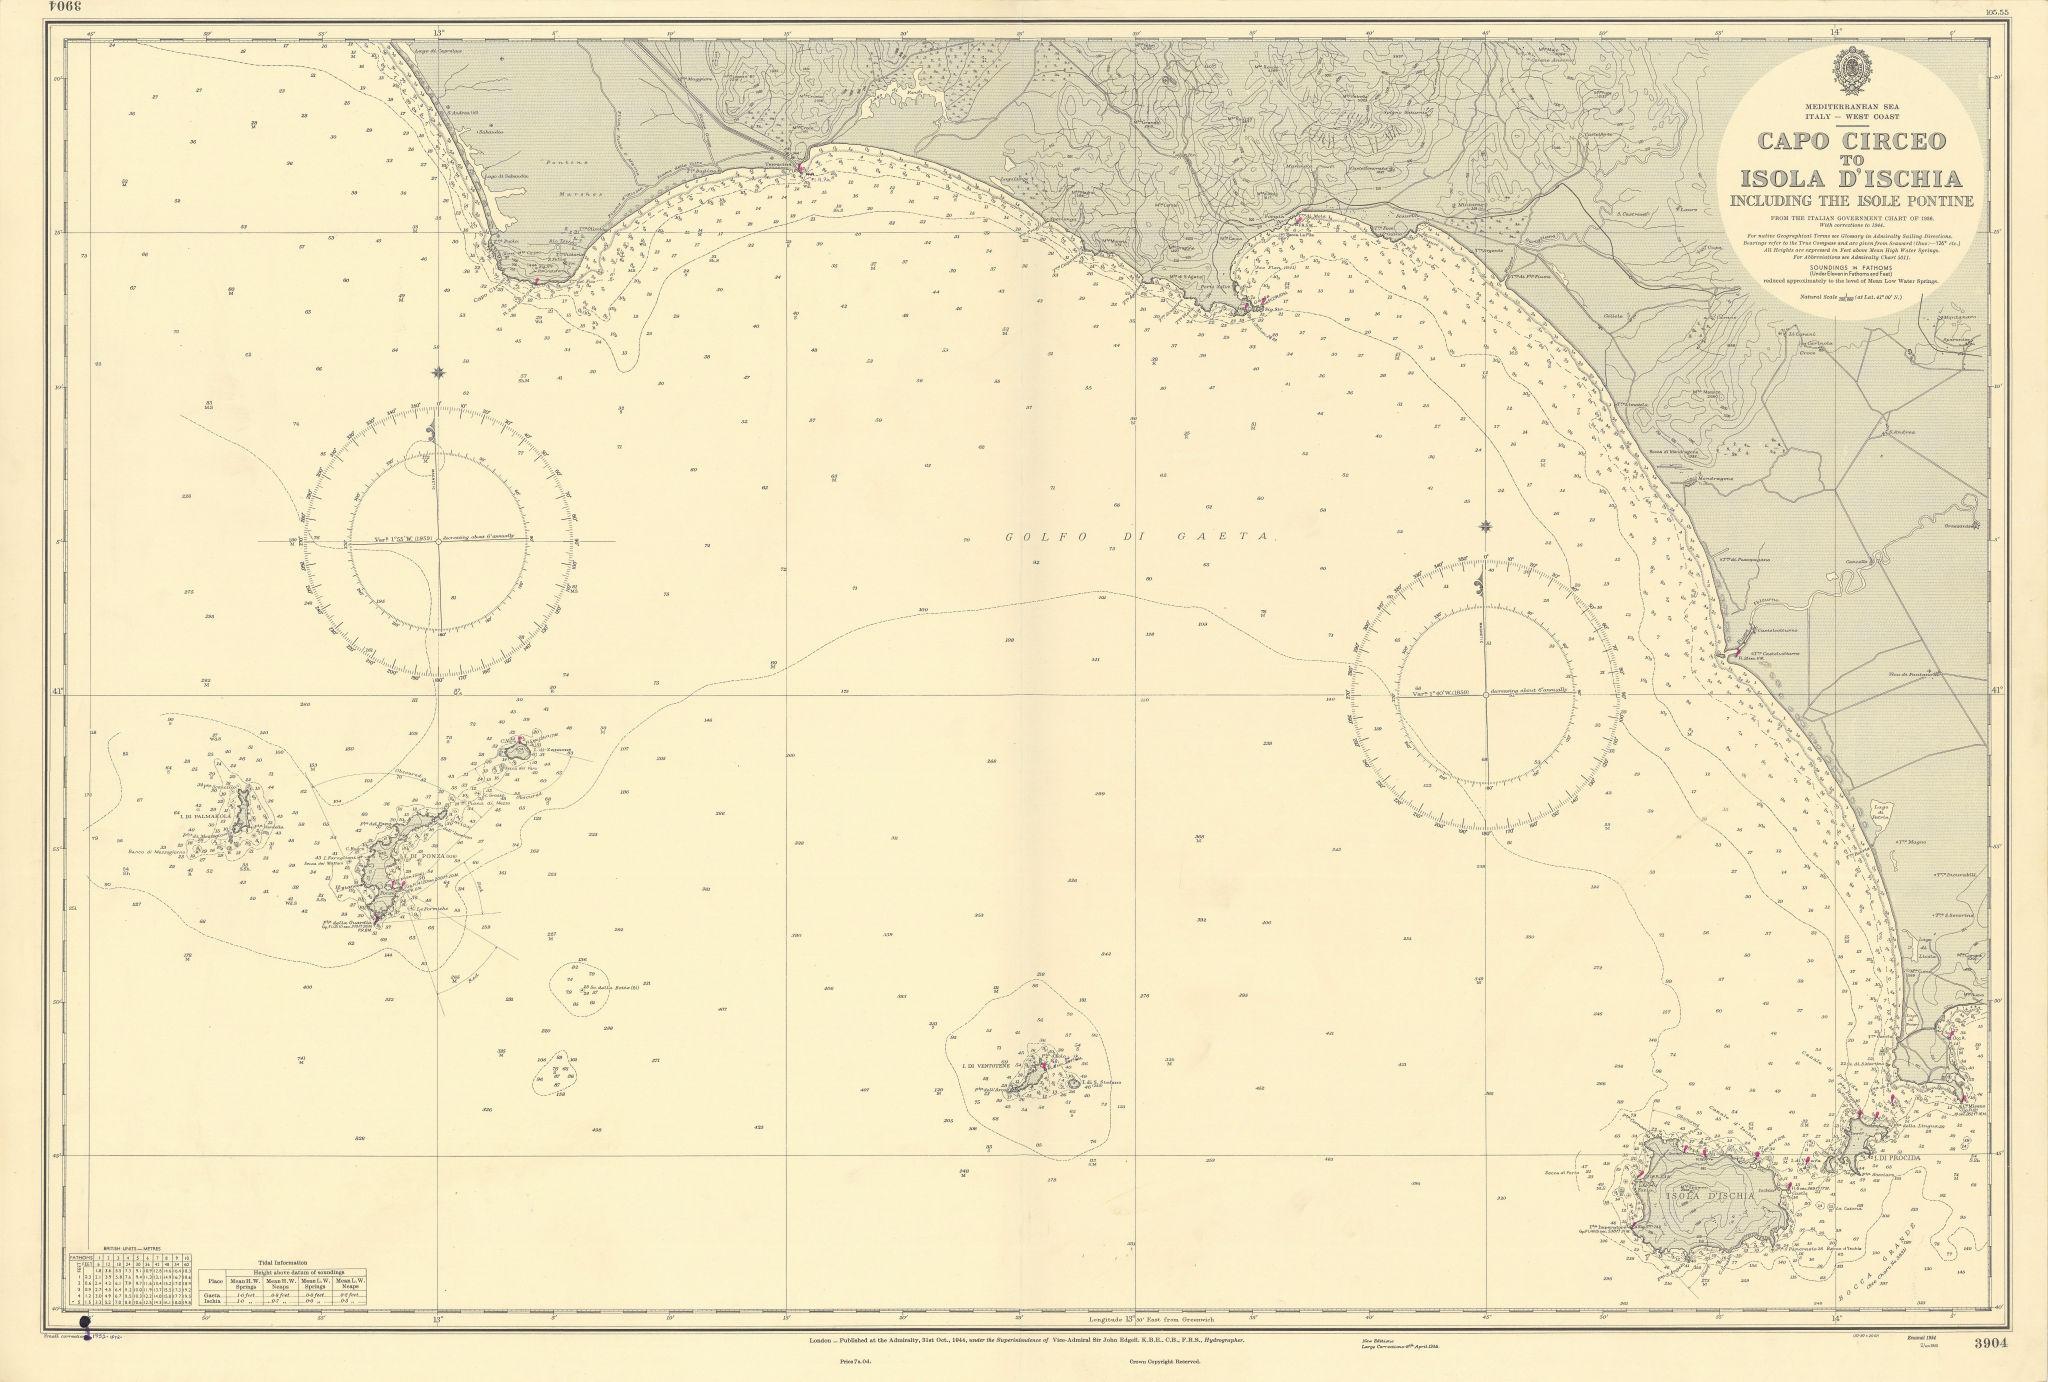 Golfo di Gaeta Capo Circeo Ischia Isole Ponziane ADMIRALTY chart 1944 (1955) map